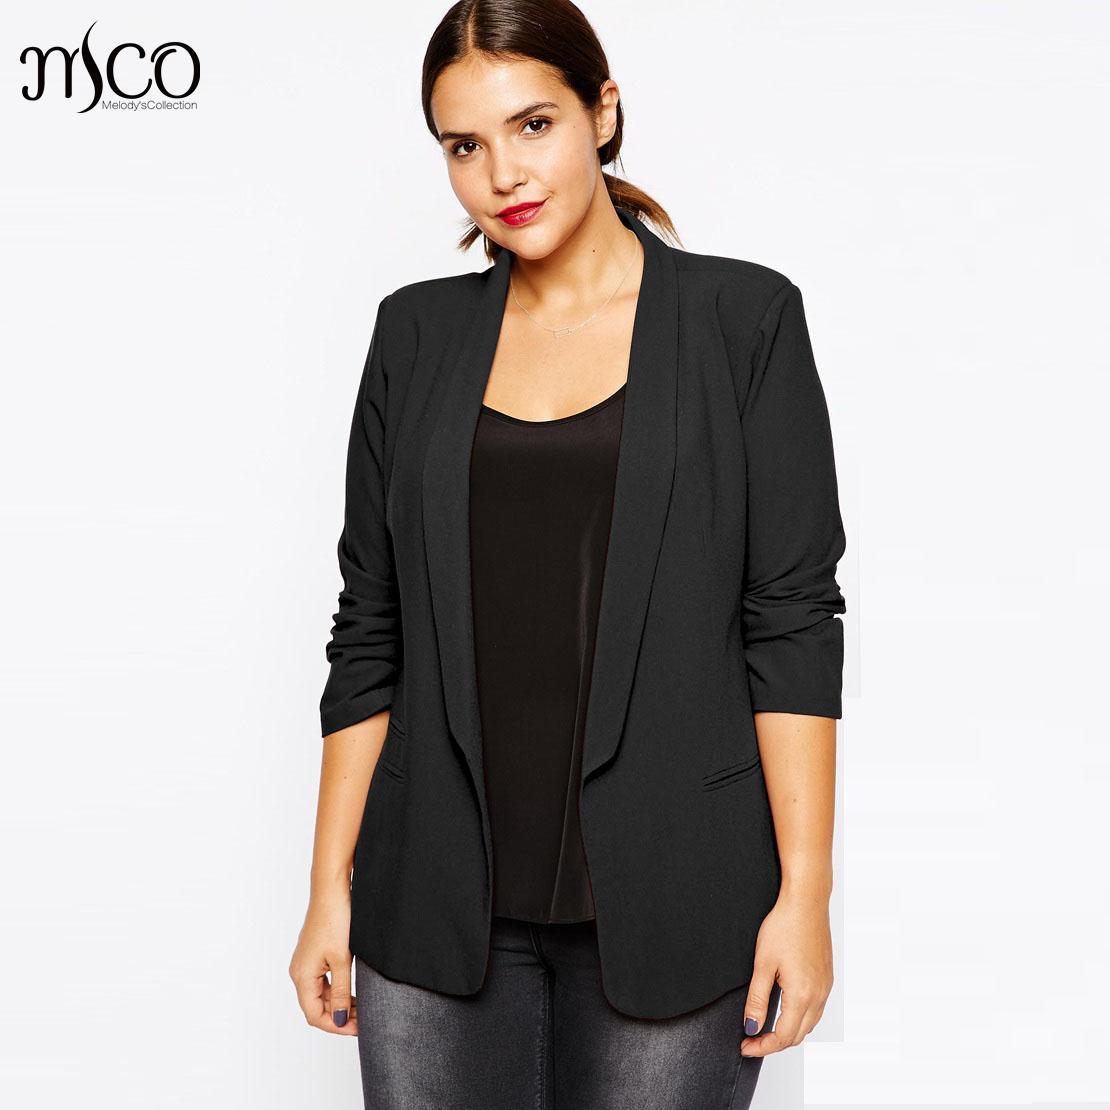 High Quality Classic Slim Lapel Linen Office Blazer feminino Basic Plus Size Textured Tailored Women Jackets and Blazers 6XL 7XL